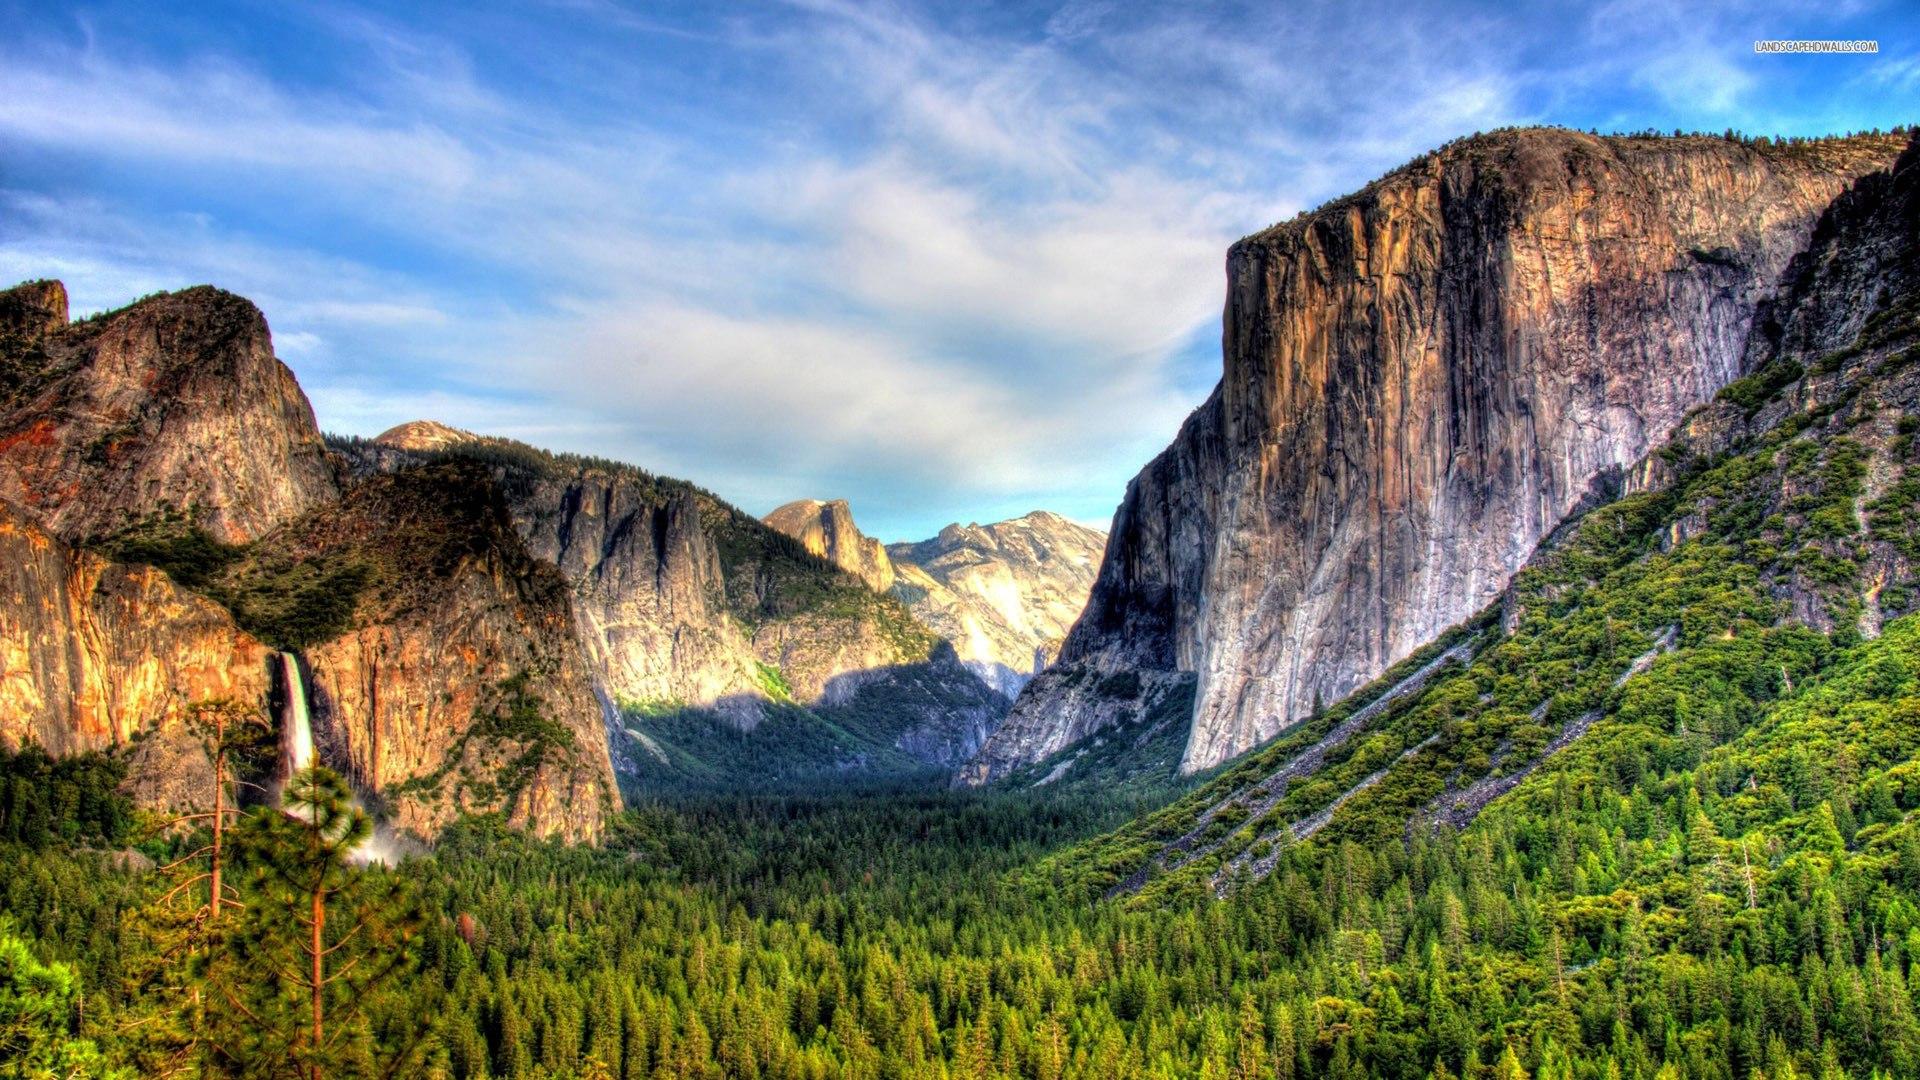 Yosemite Mountain Landscape Wallpaper HD 14 High Resolution Wallpaper 1920x1080